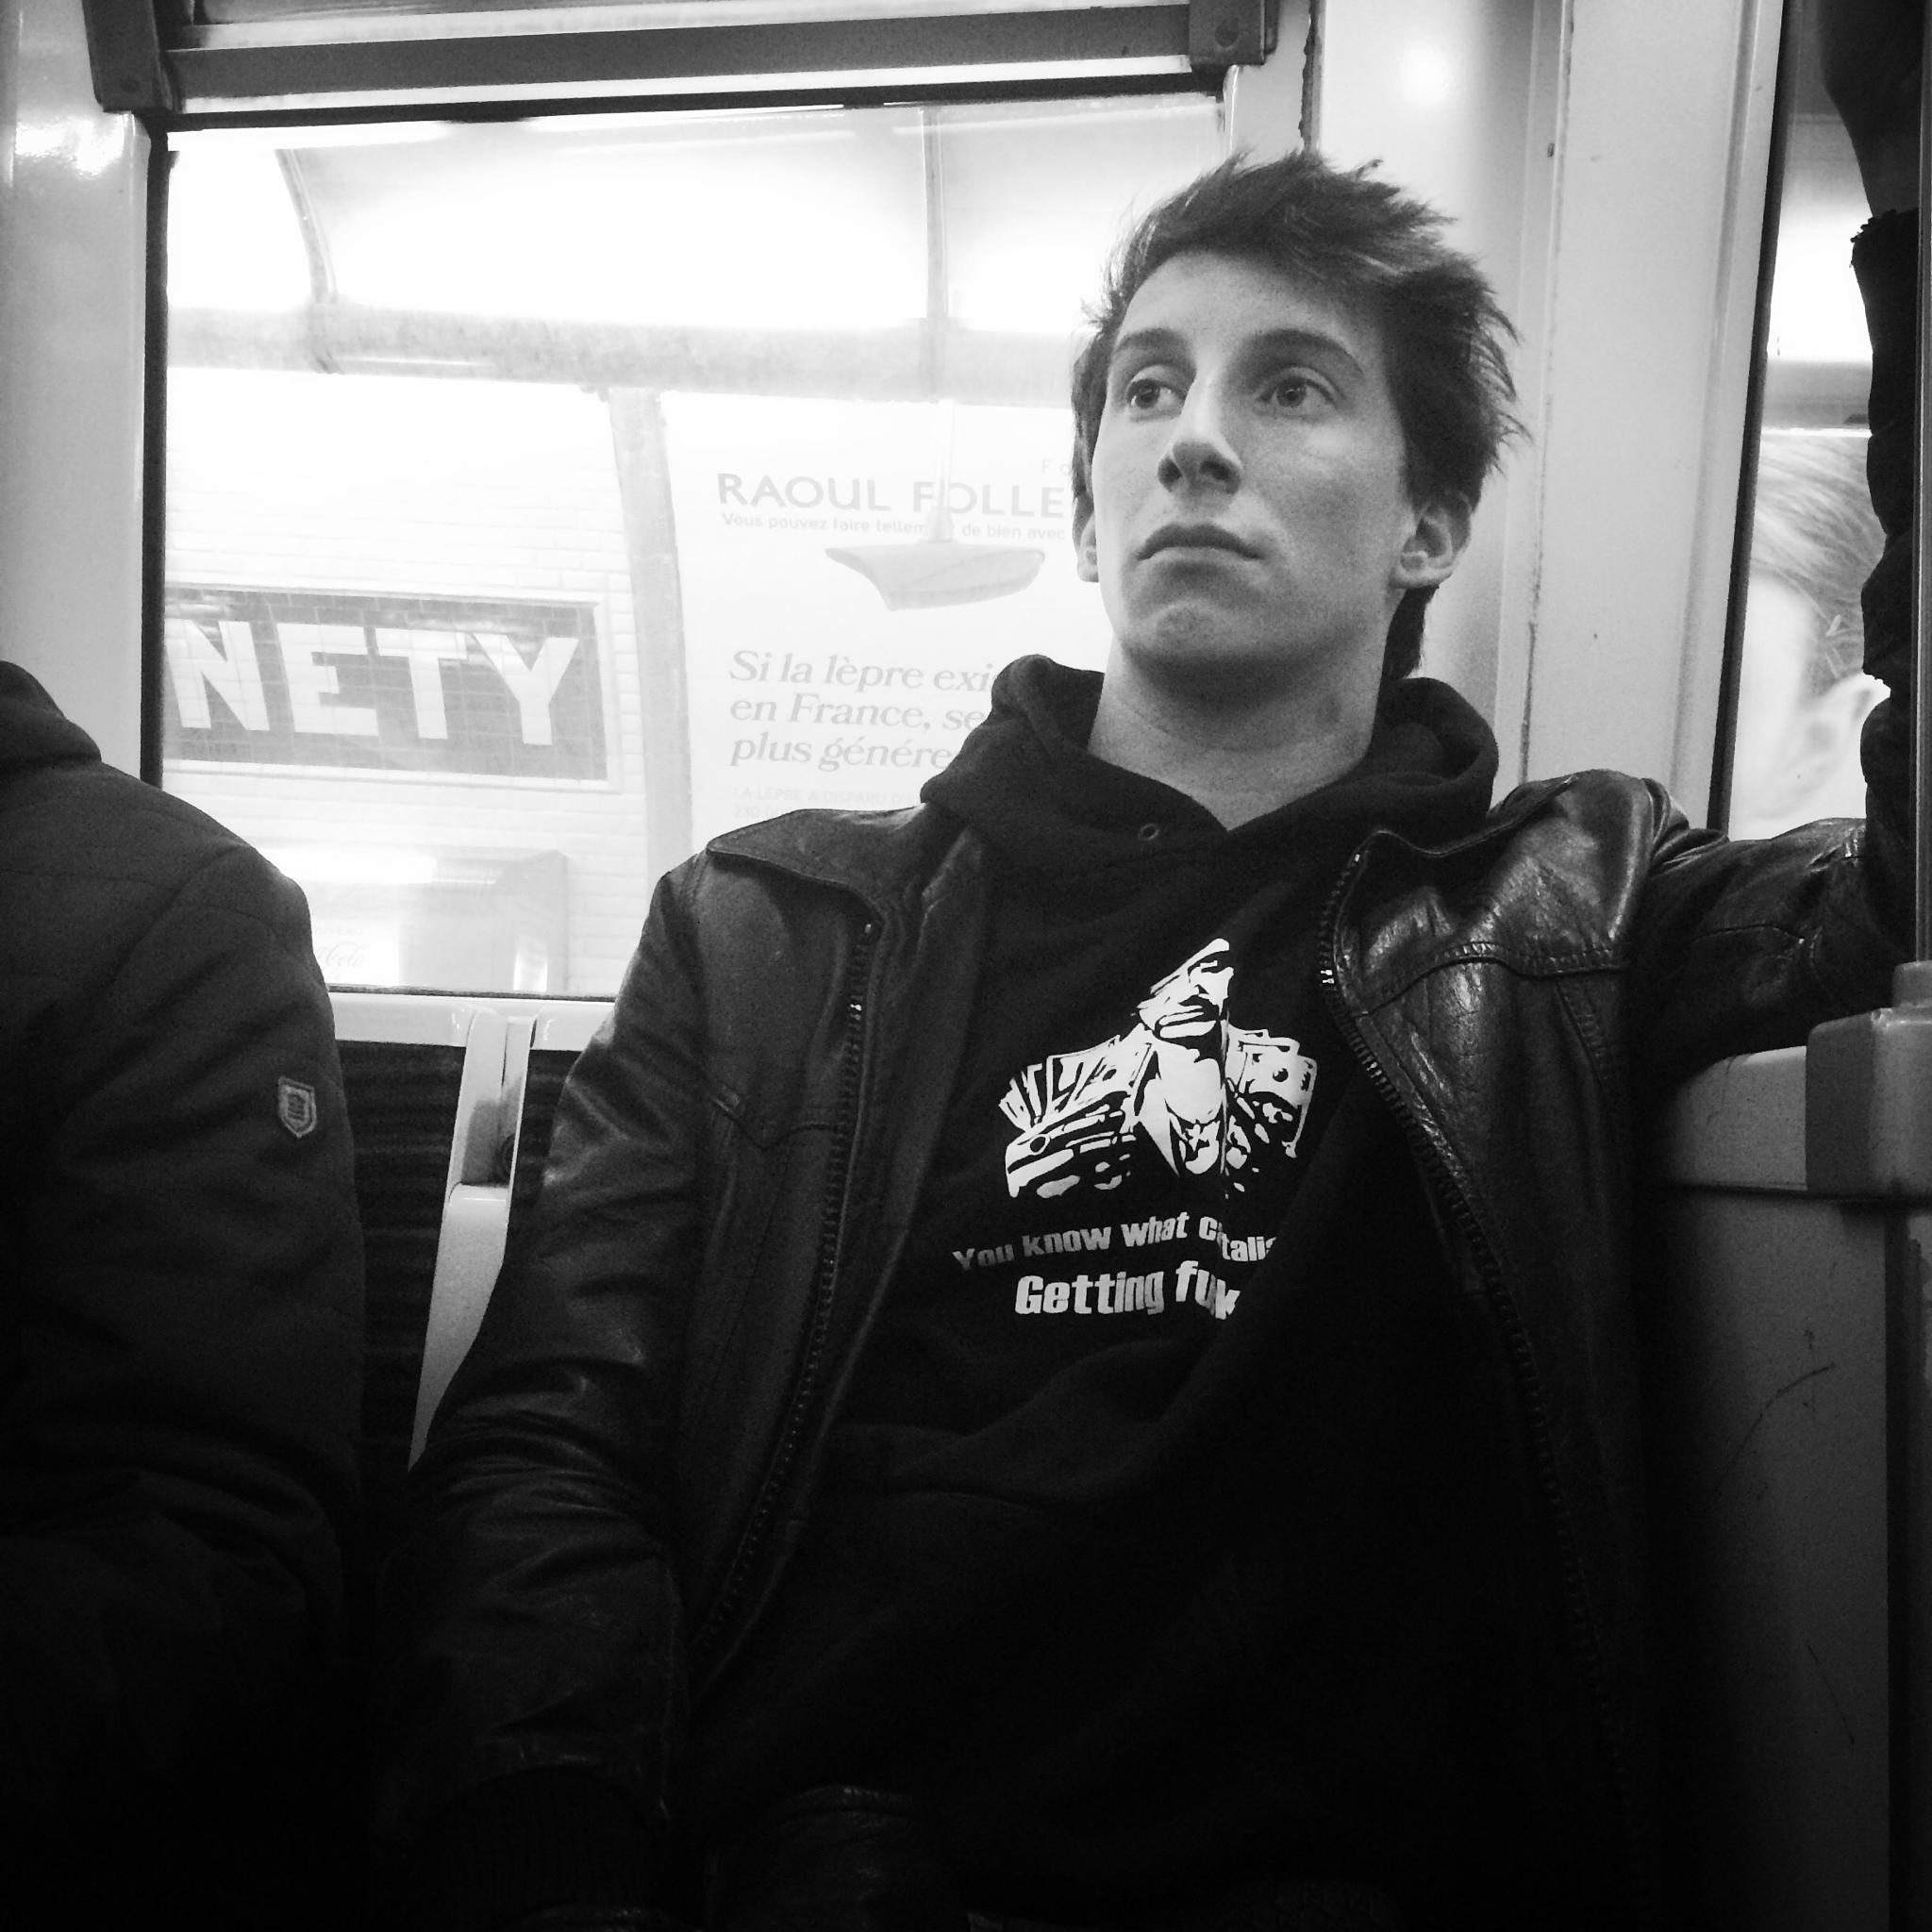 Metro Pernety by parisfind